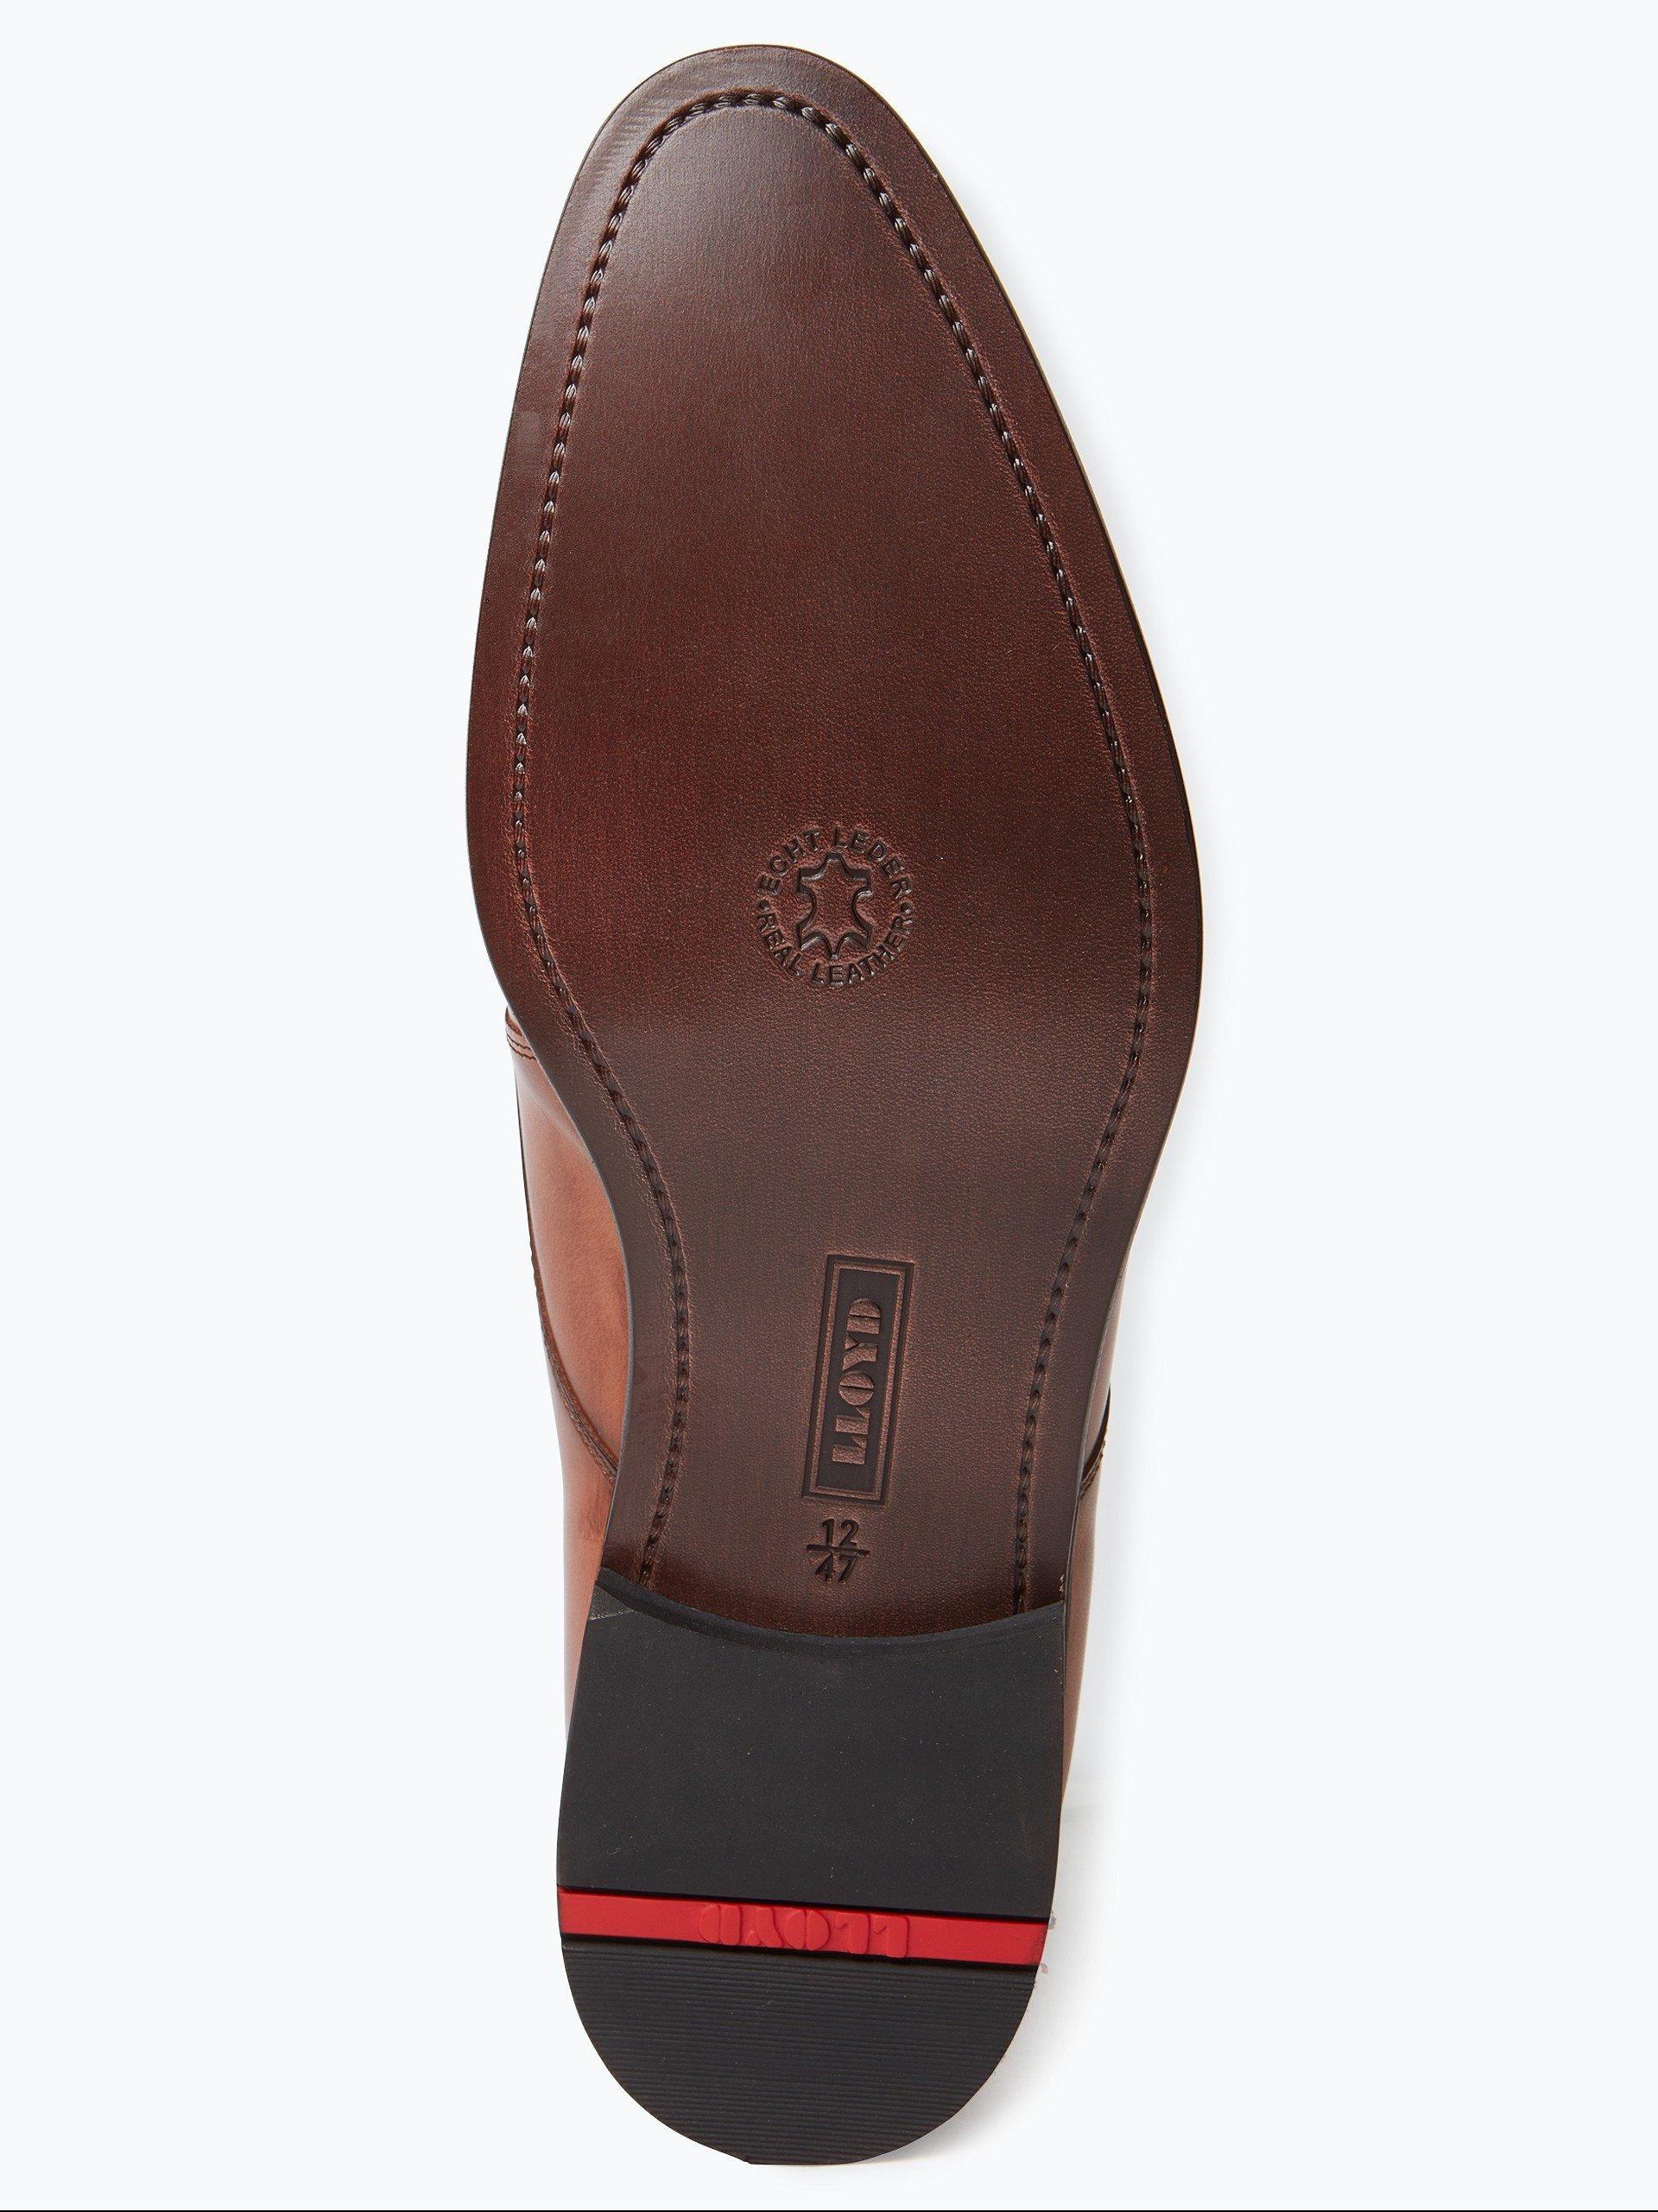 Lloyd Herren Schnürschuhe aus Leder - Ocas